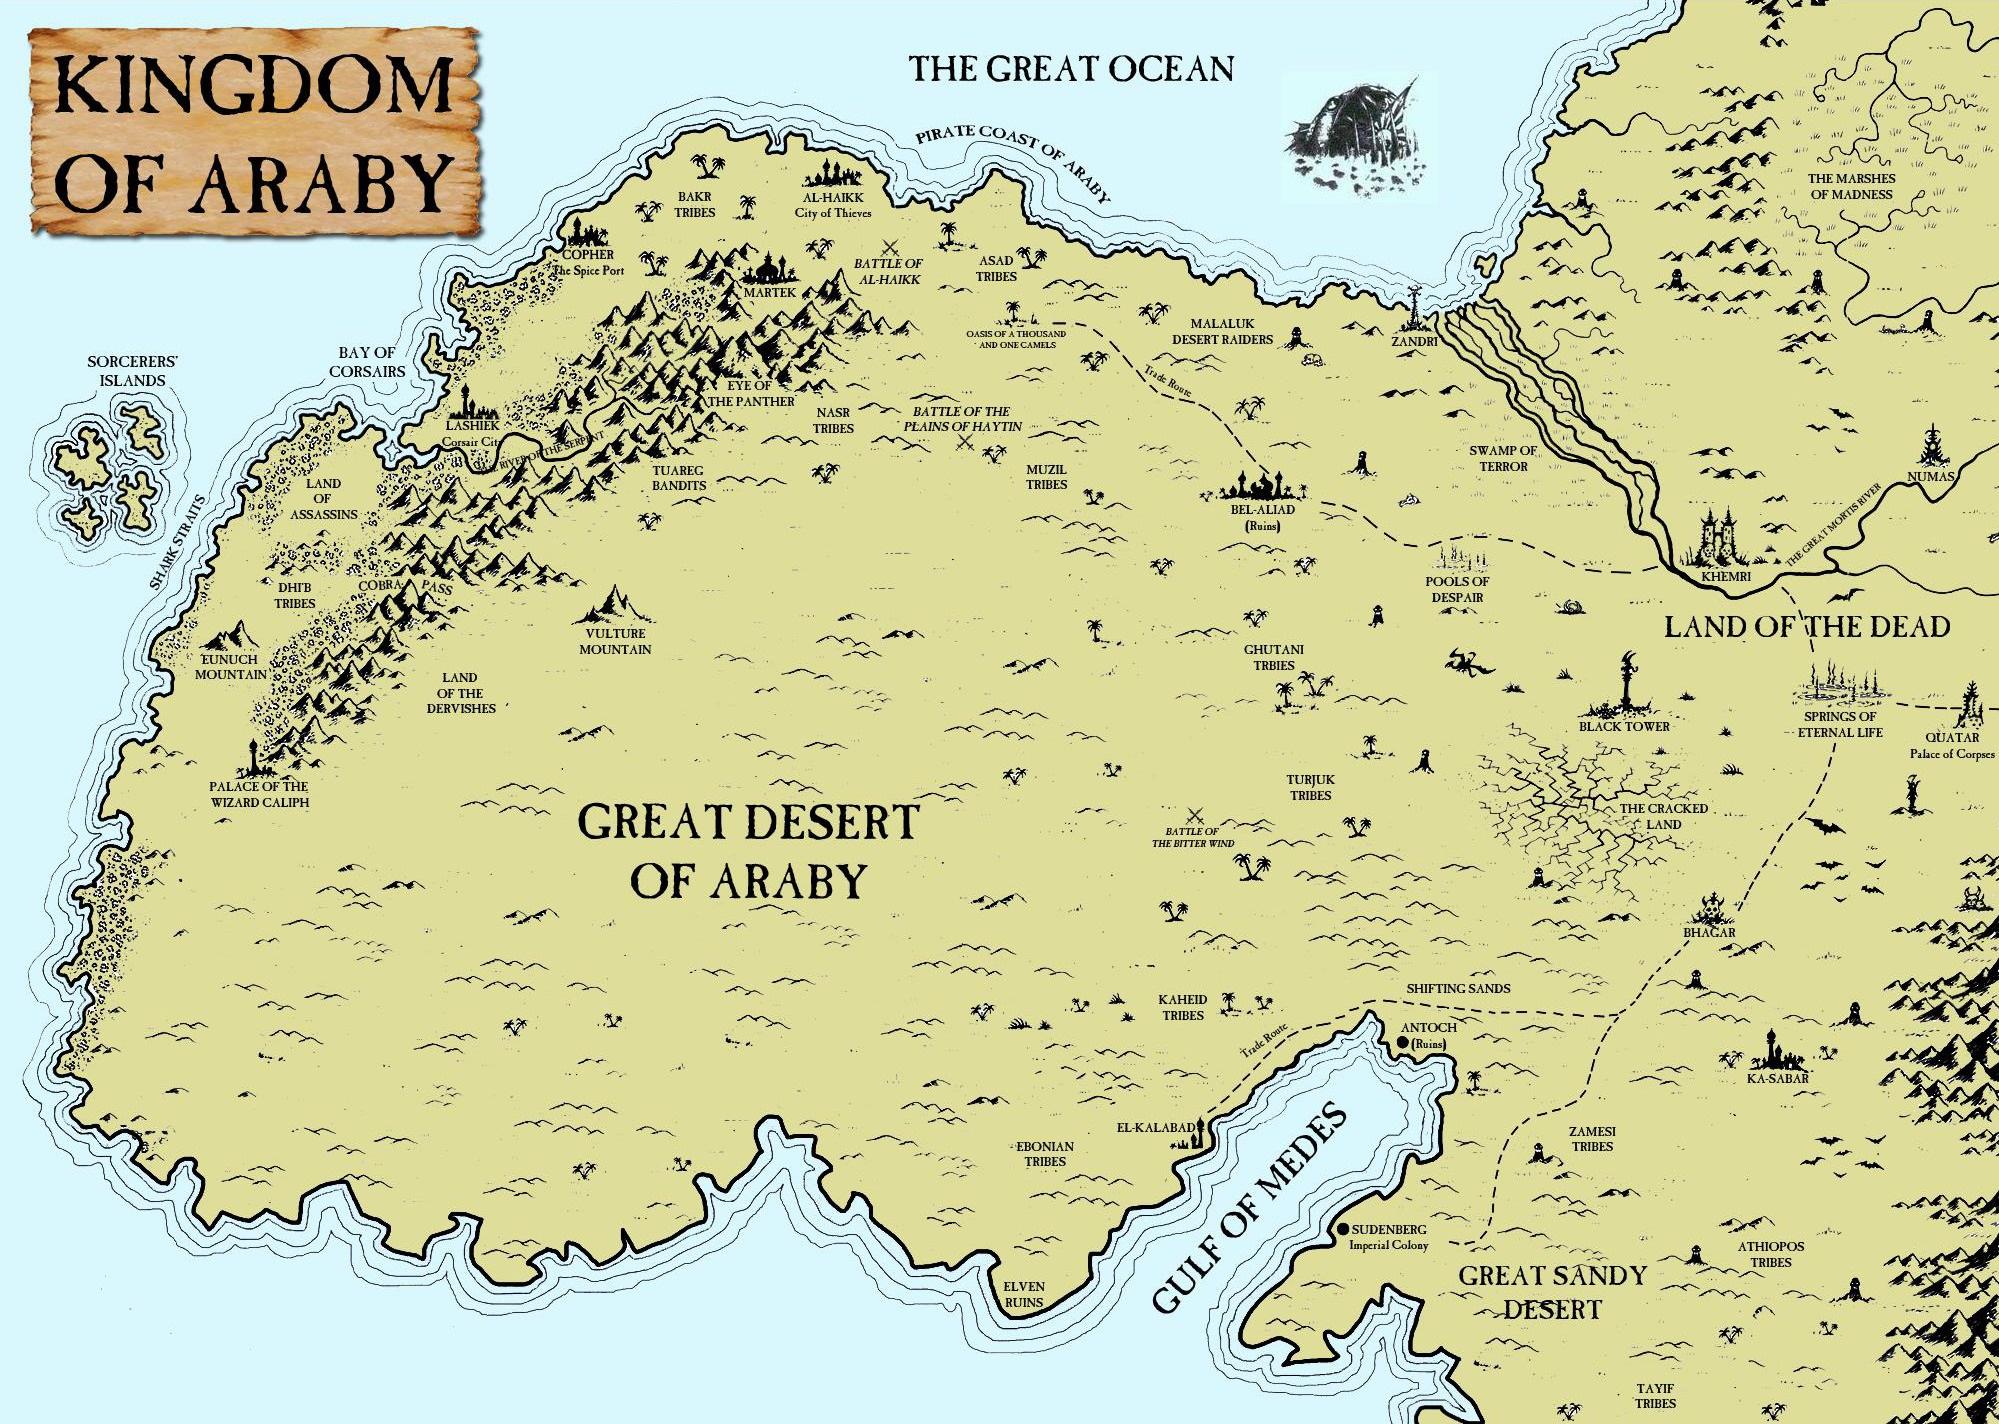 map of thedas with Araby on 91479436155712287 also Worldmap Of Caeruin 3 143486236 also To Villavicencio We Go also Ferelden 431881315 further 2WWczech.